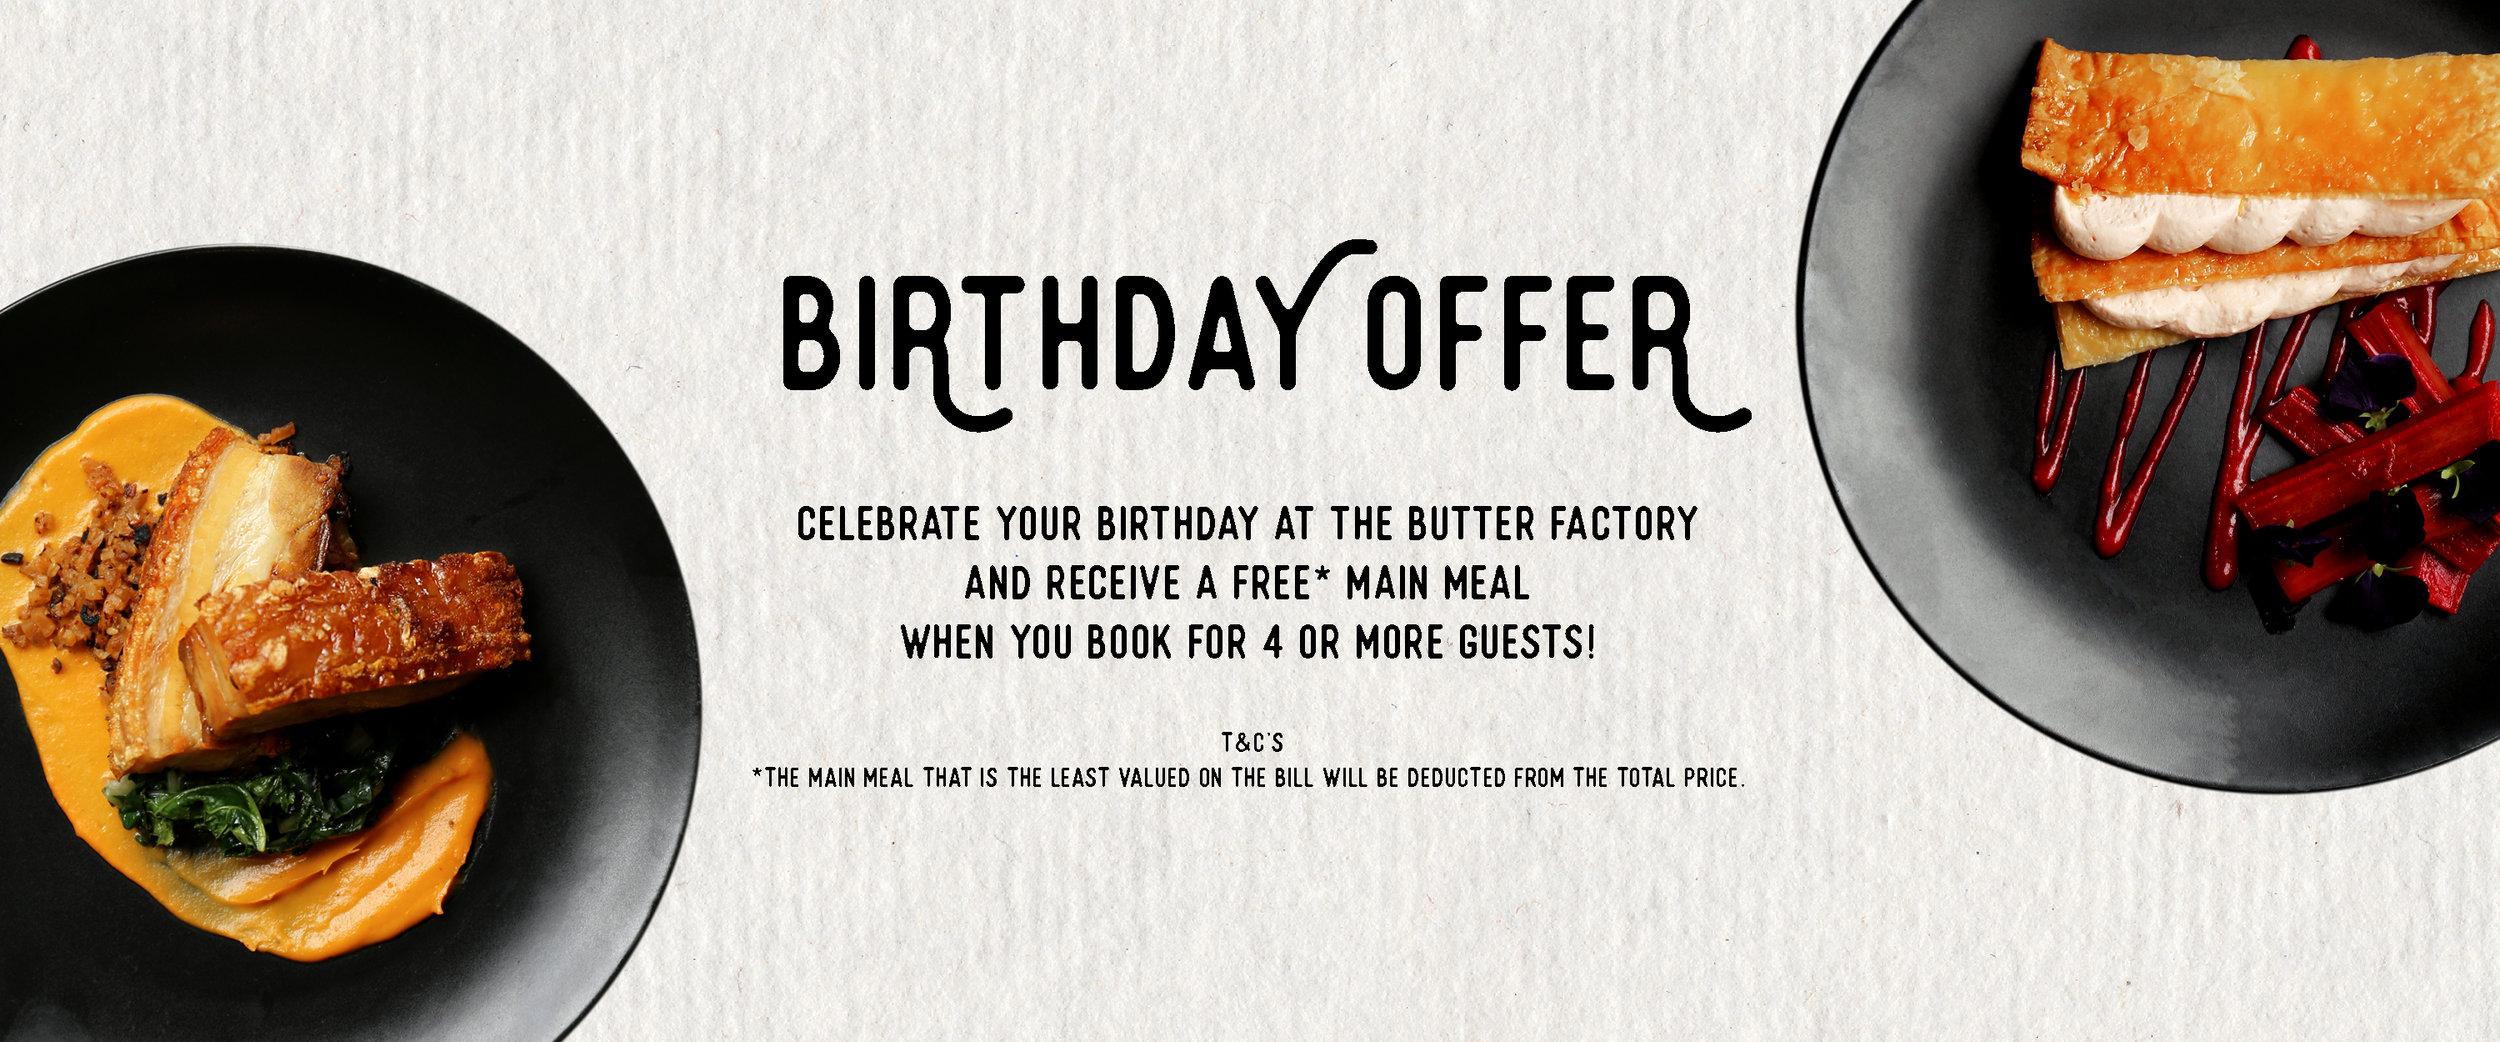 The Butter Factory - Birthday Deal Website Leaderboard.jpg